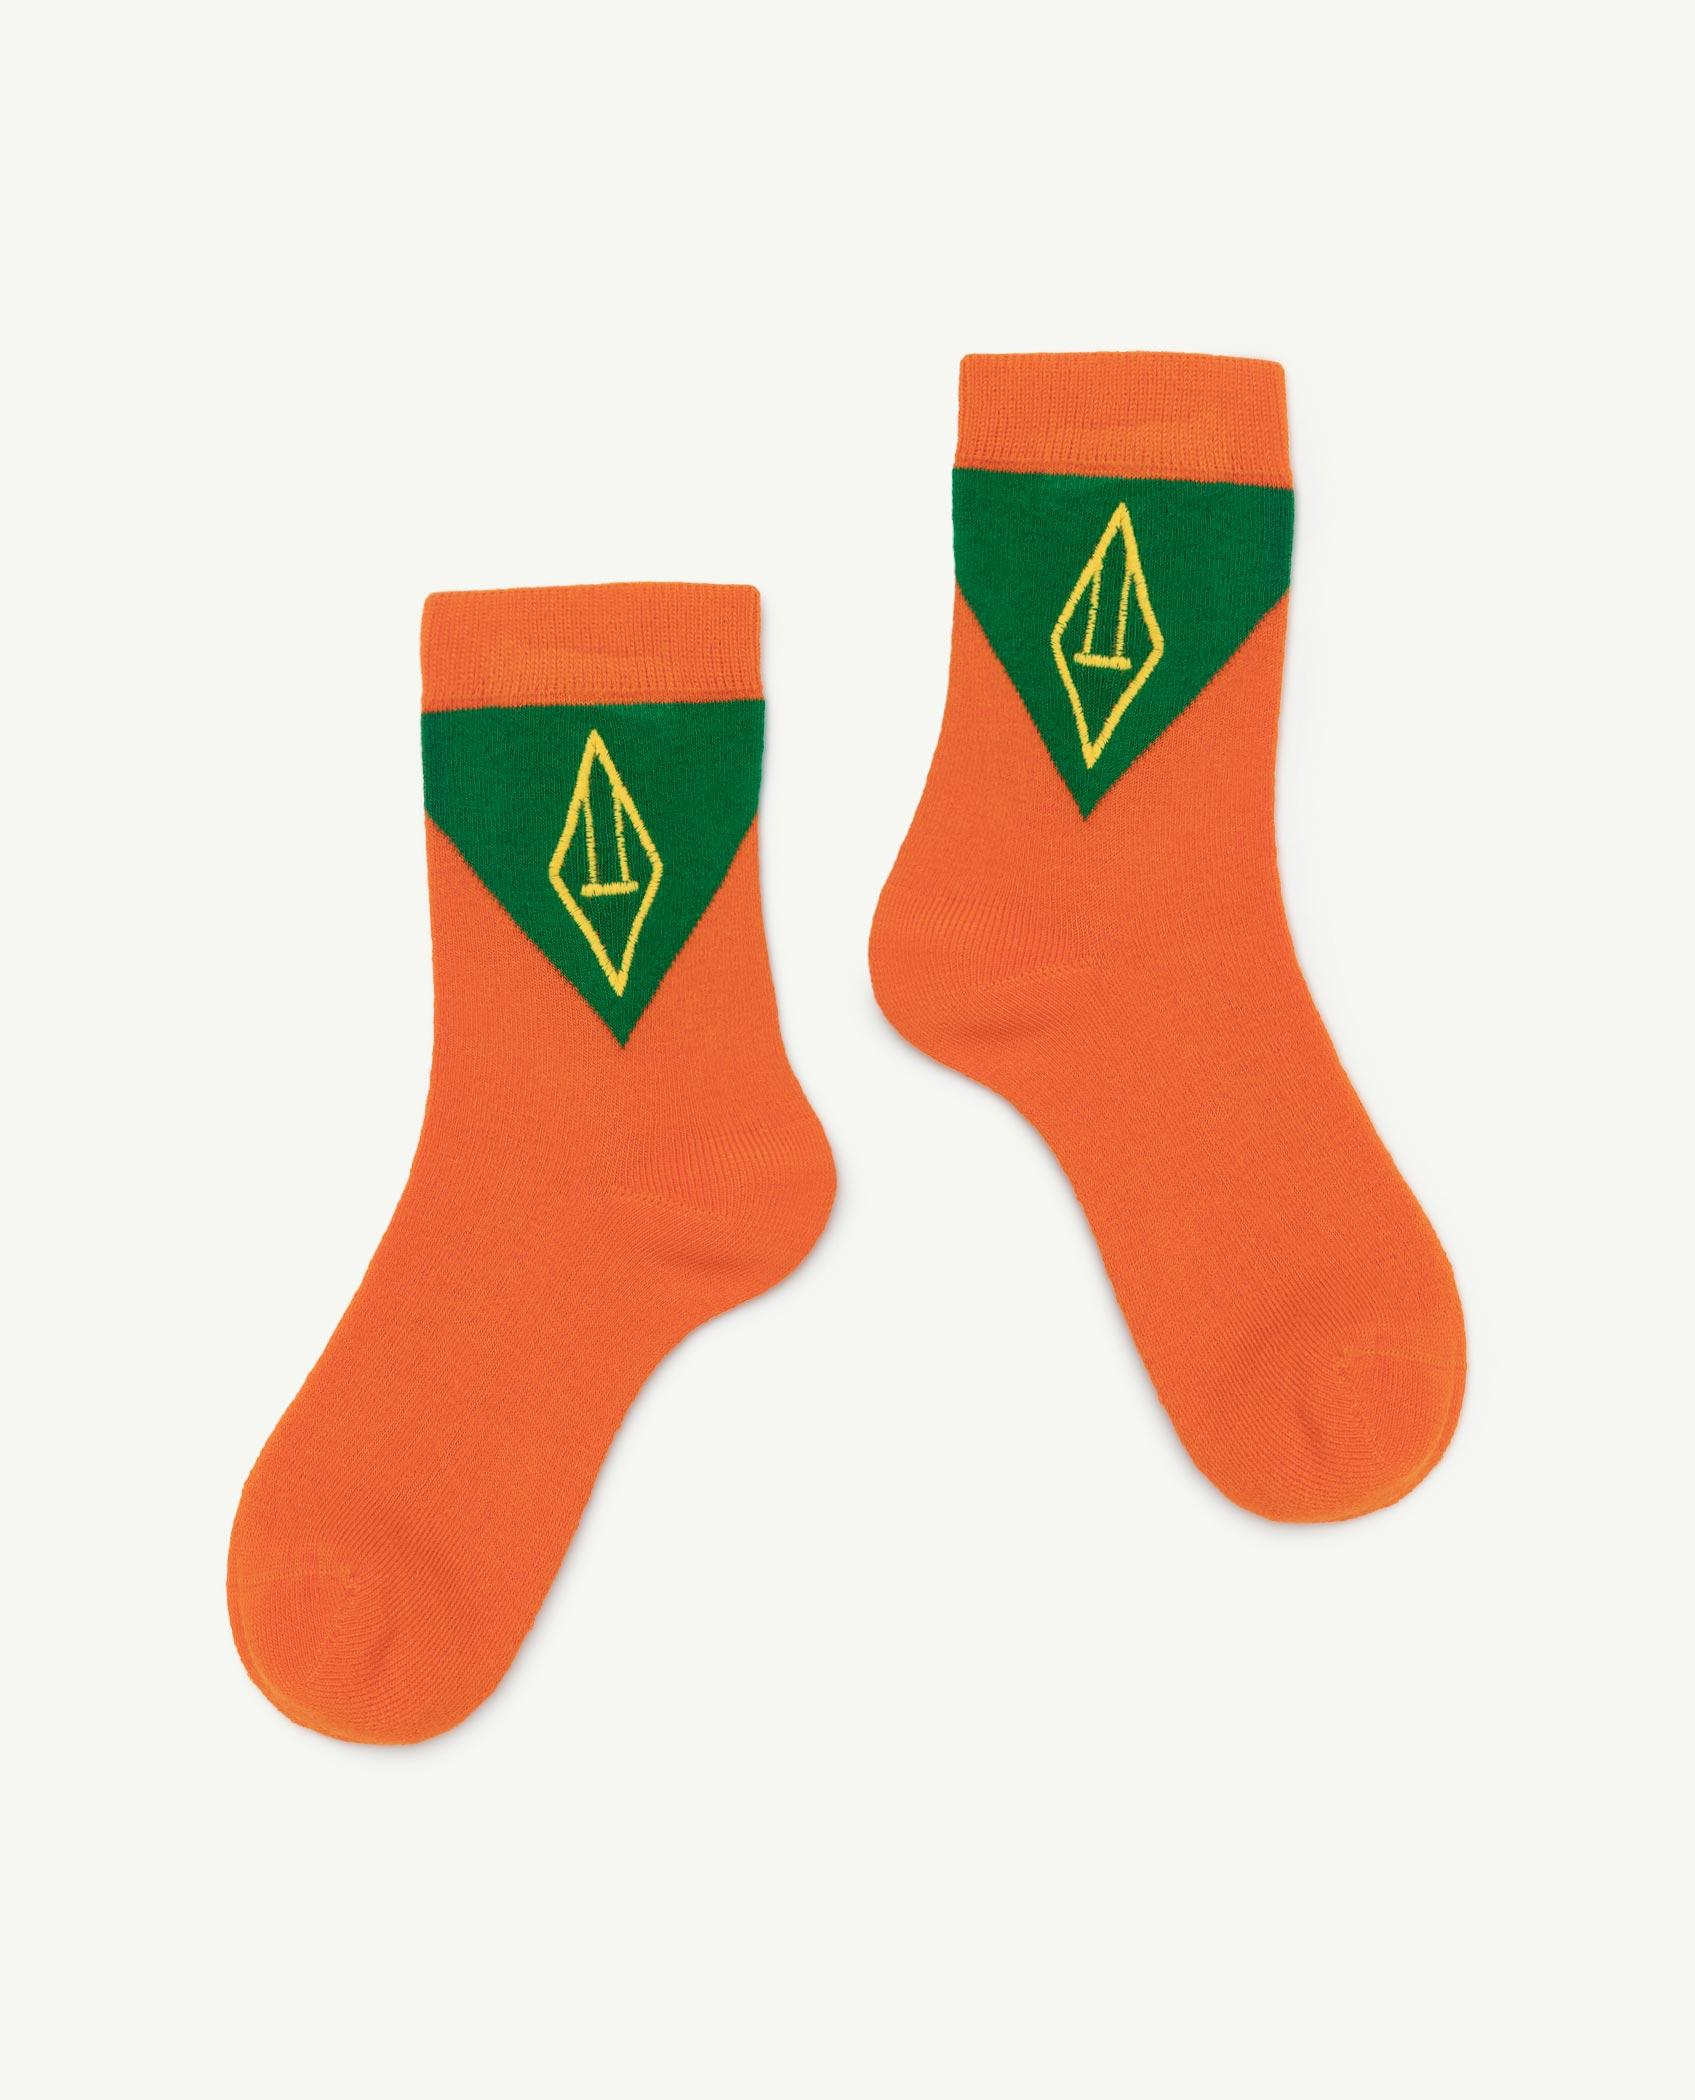 the animals observatory skunk socks orange logo